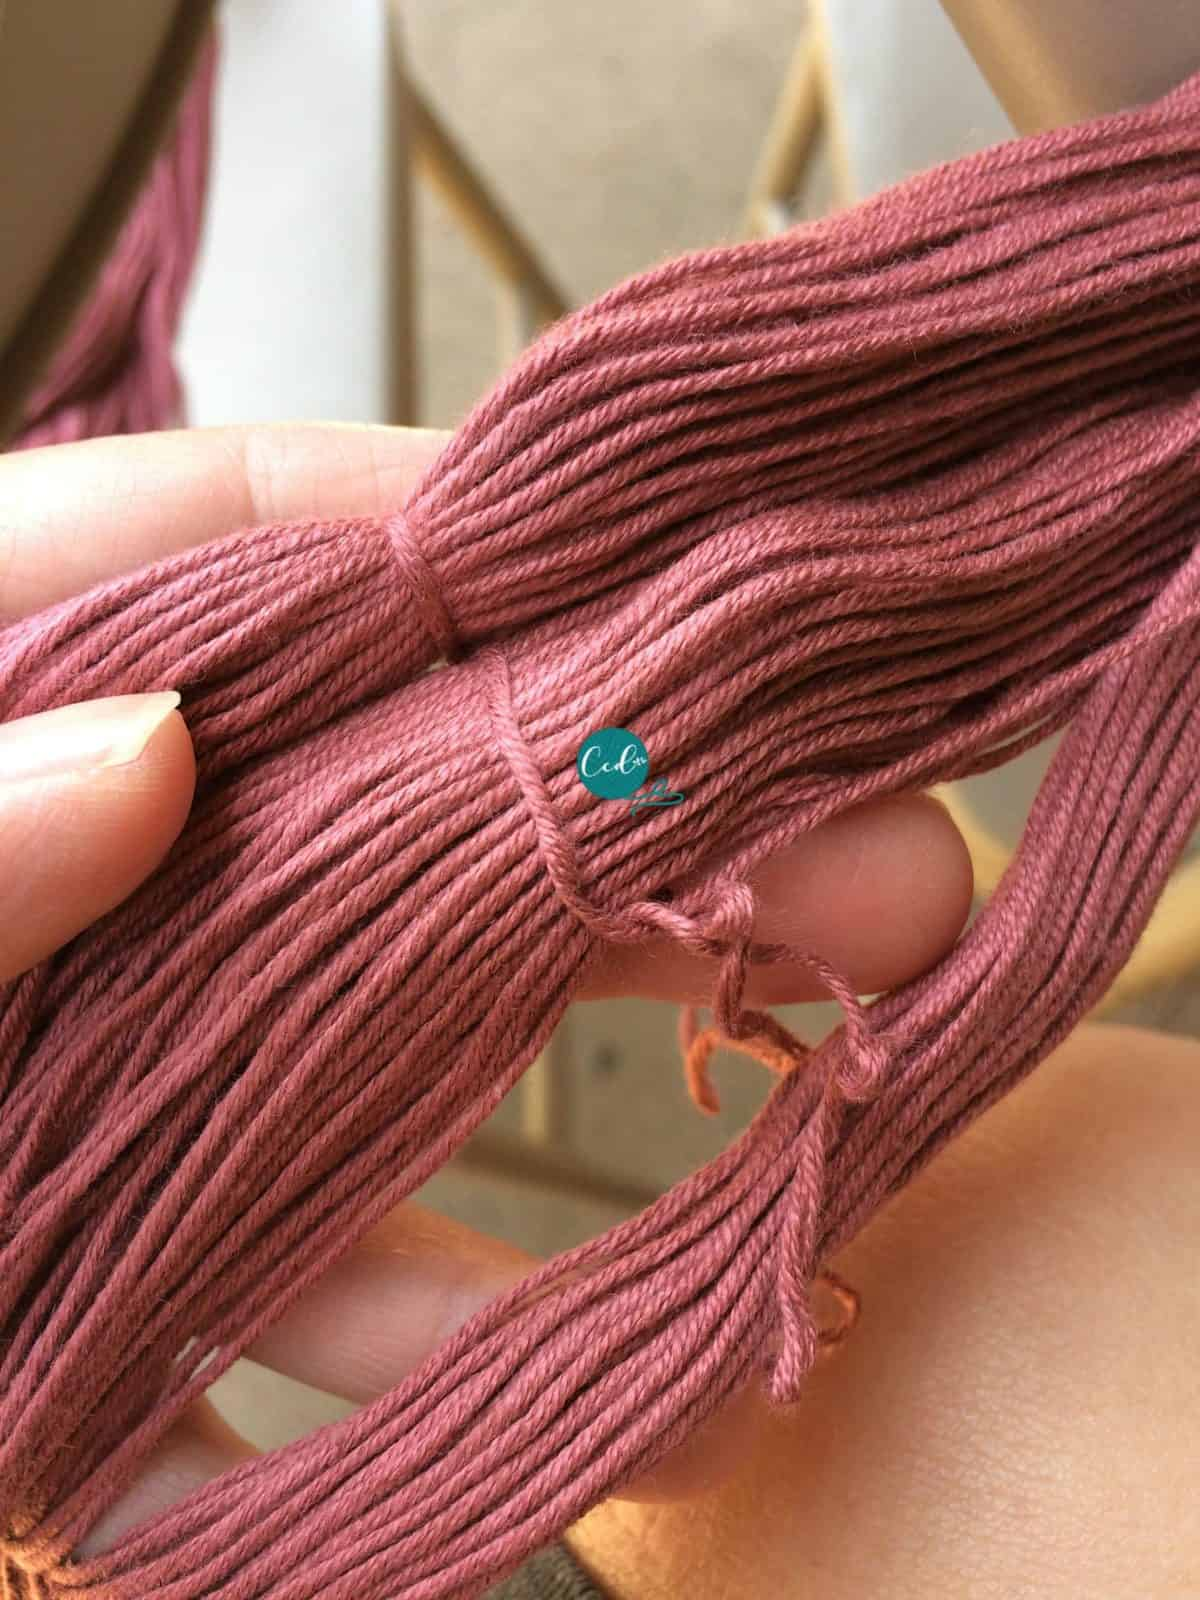 Untie the knots.